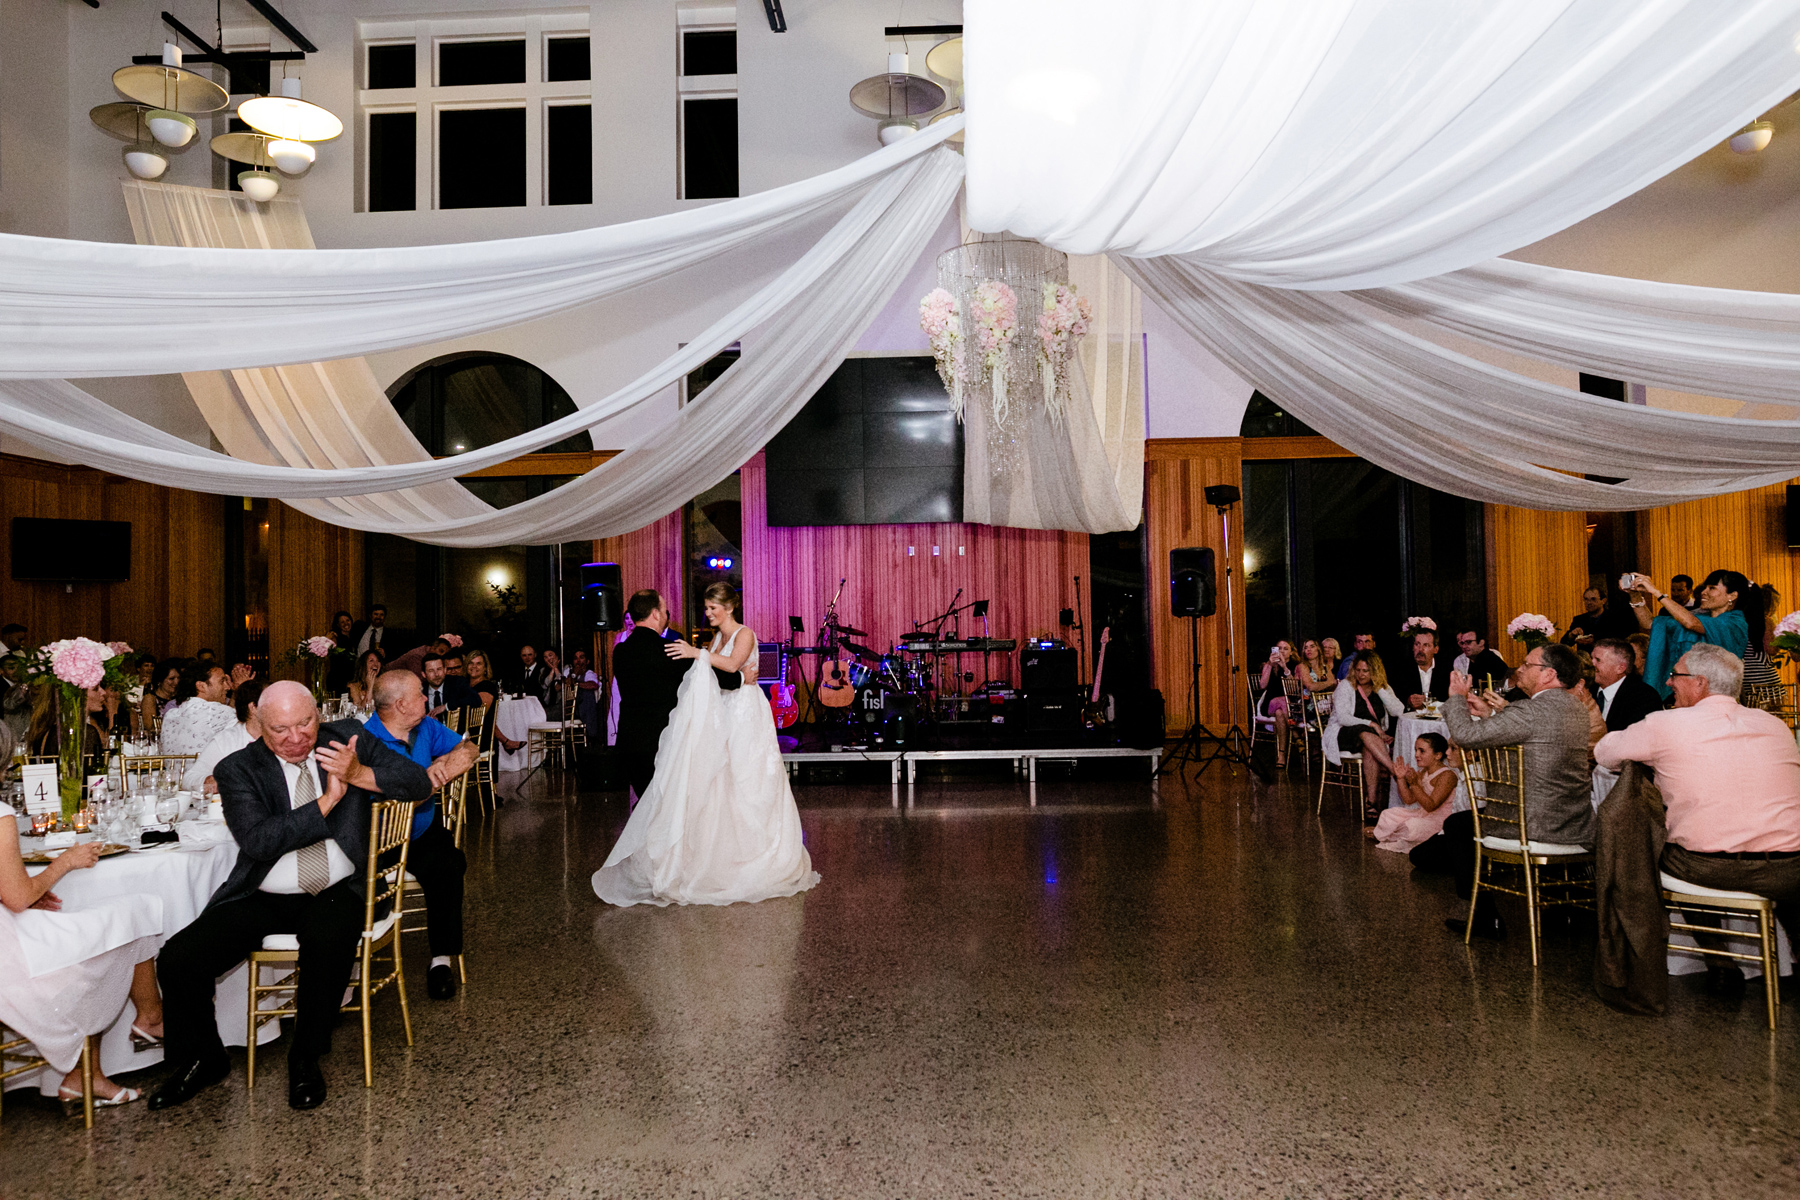 saint-john-wedding-photography-kandisebrown-pa2017-60